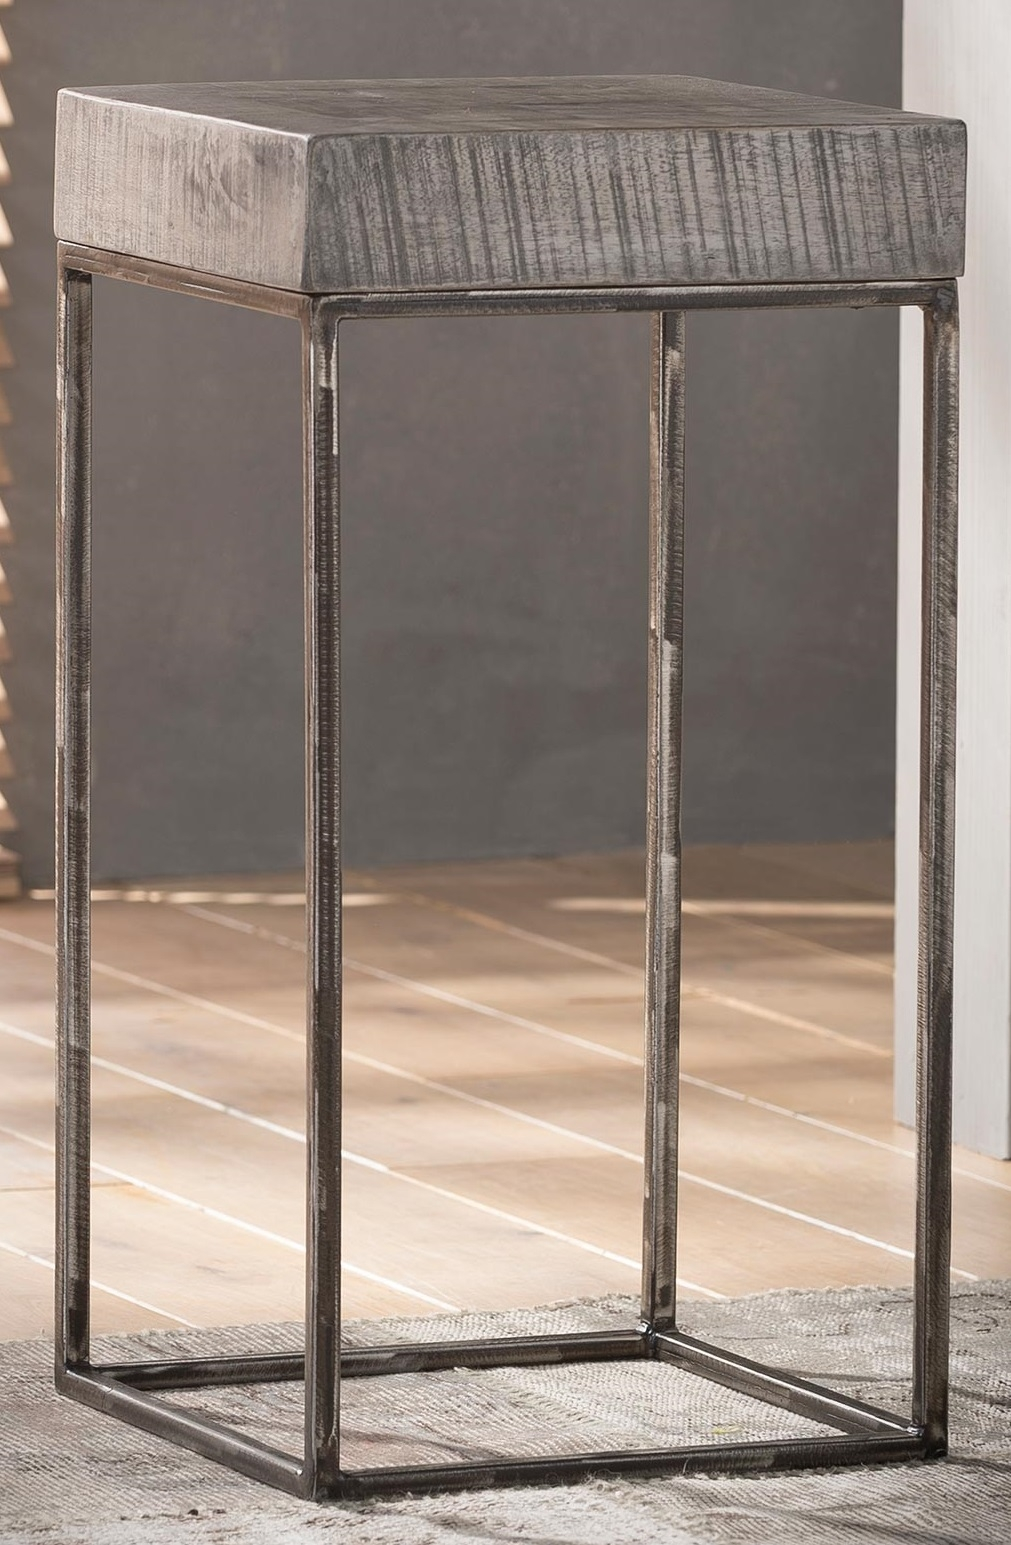 Bloemenzuil Iwan 70 cm hoog – Grijs Antiek | Zaloni